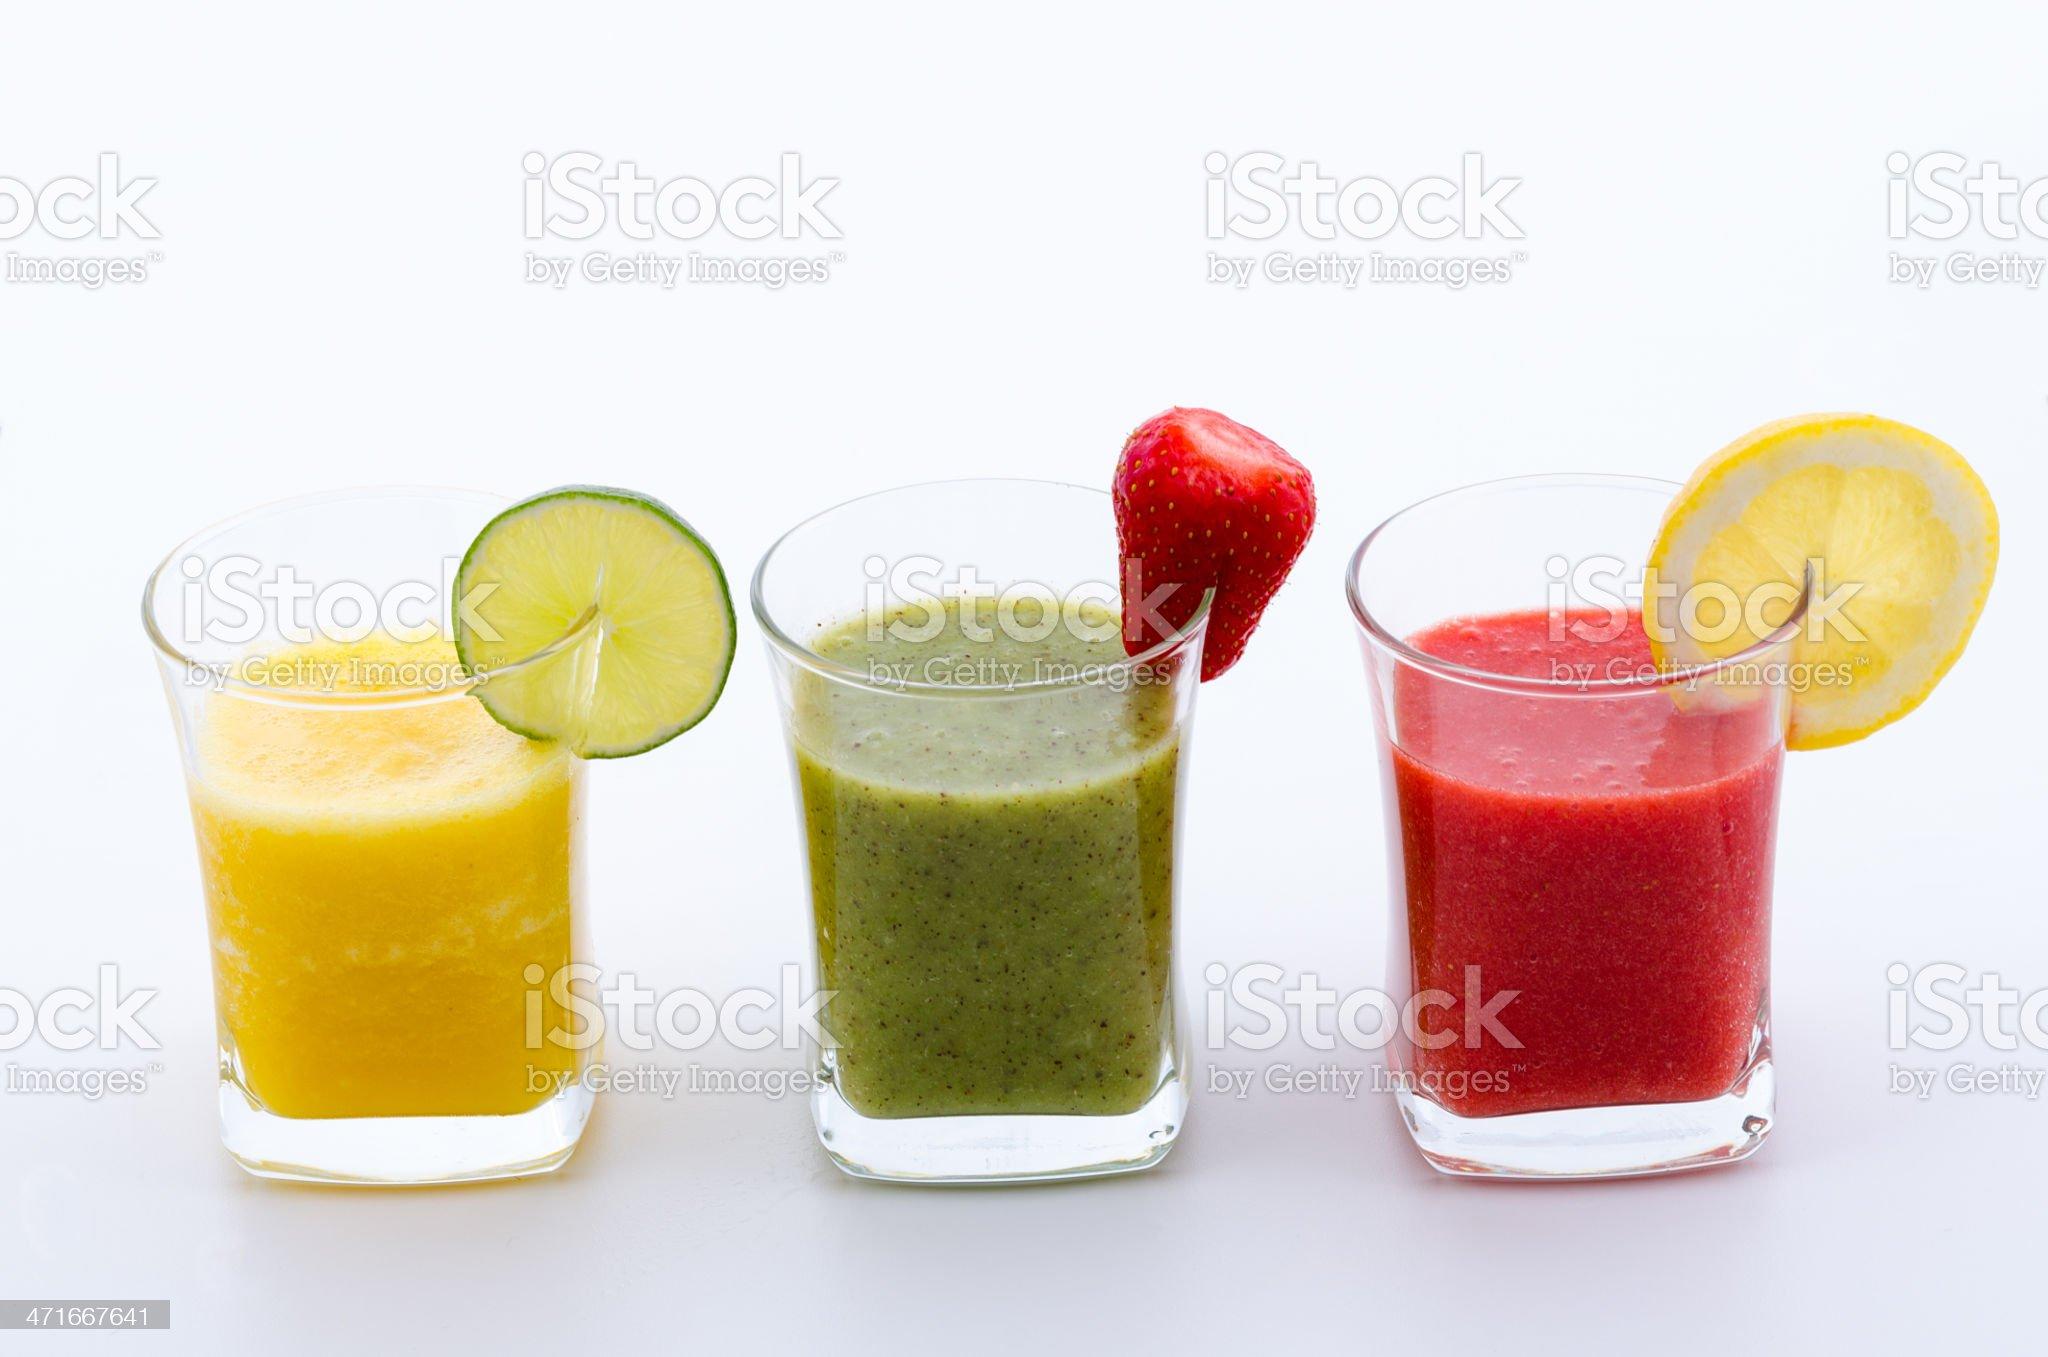 Fruit smoothies royalty-free stock photo